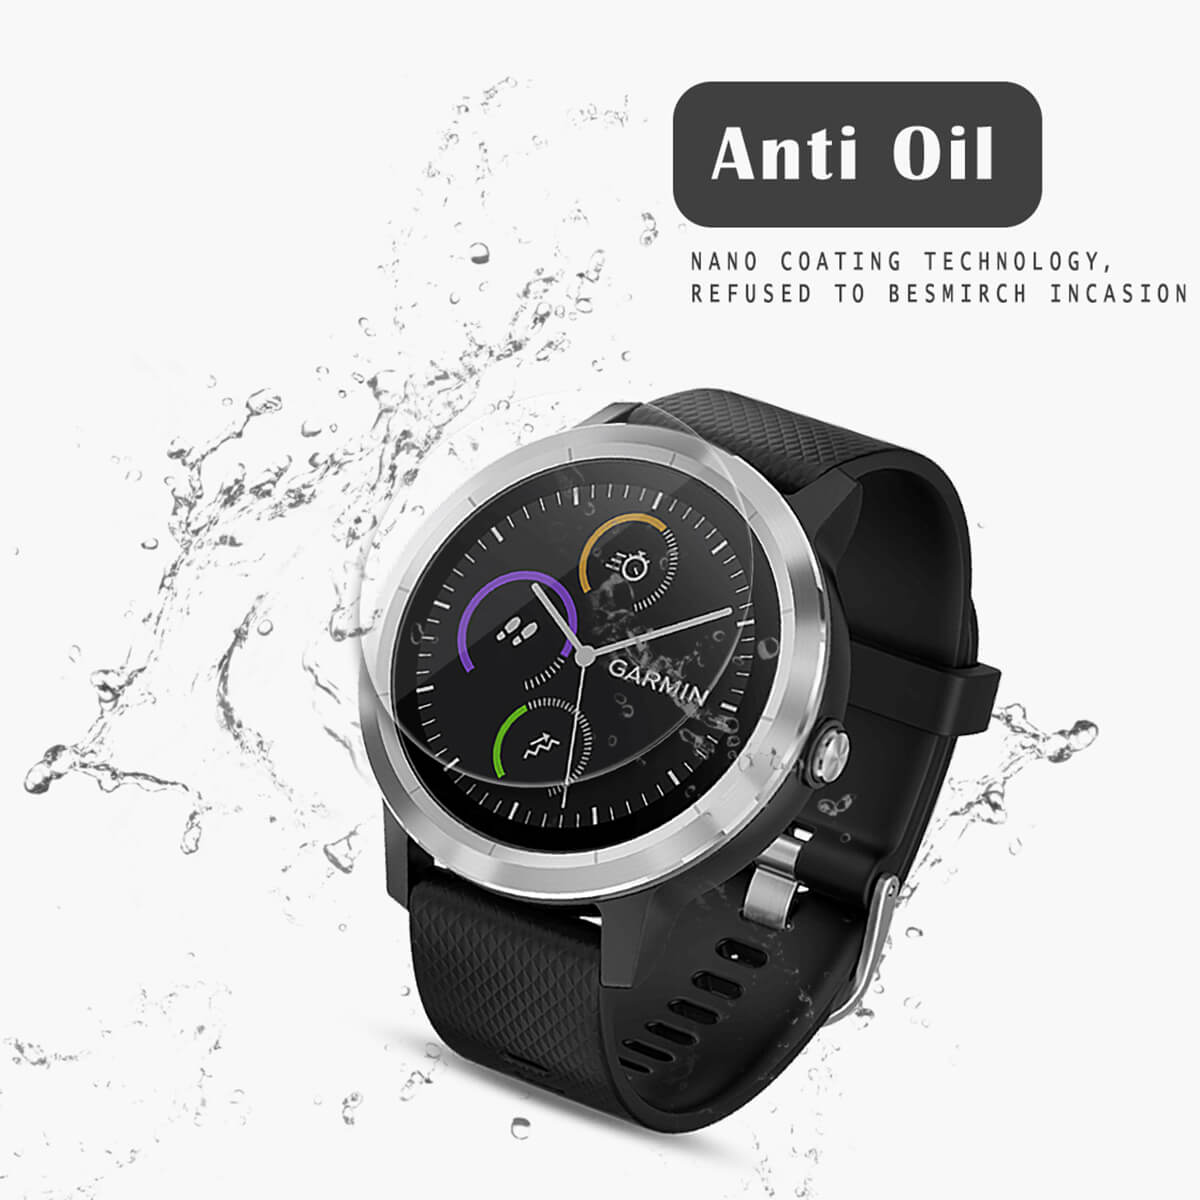 VMAX Garmin Vivoactive 3 Smart Watch Tempered Glass Screen Protector